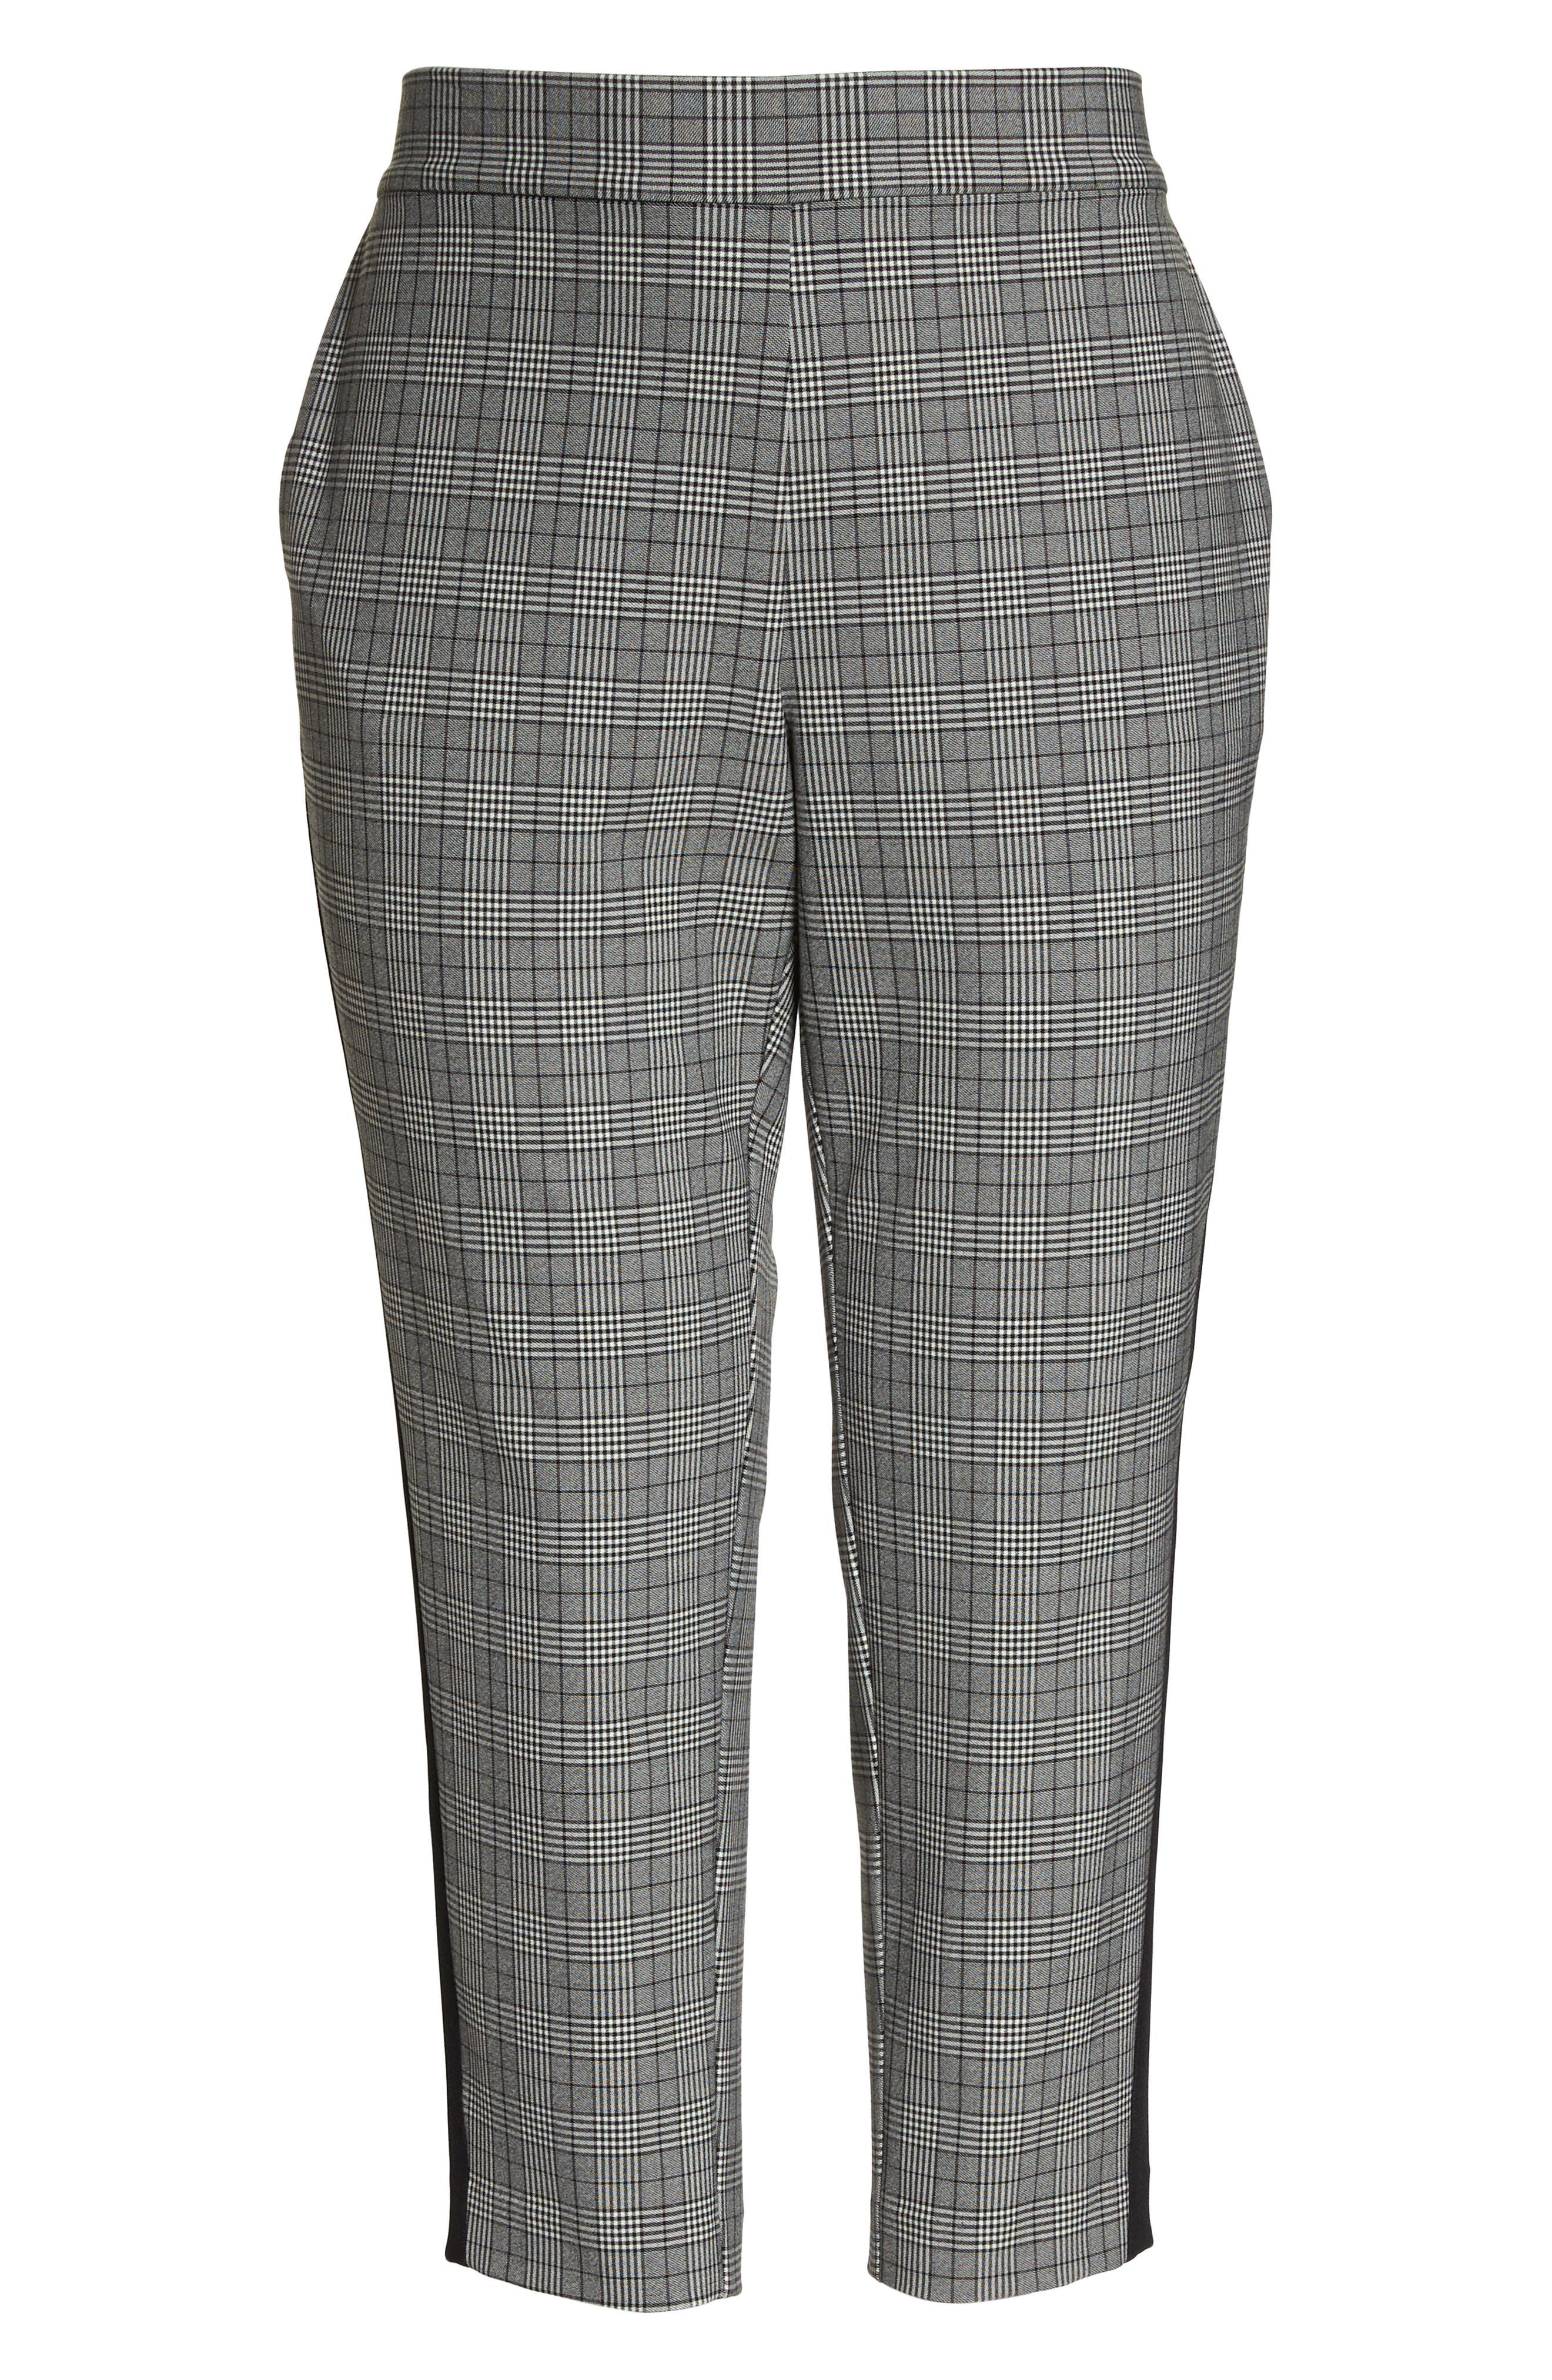 Menswear Crop Pants,                             Alternate thumbnail 6, color,                             HEATHER GREY COMBO